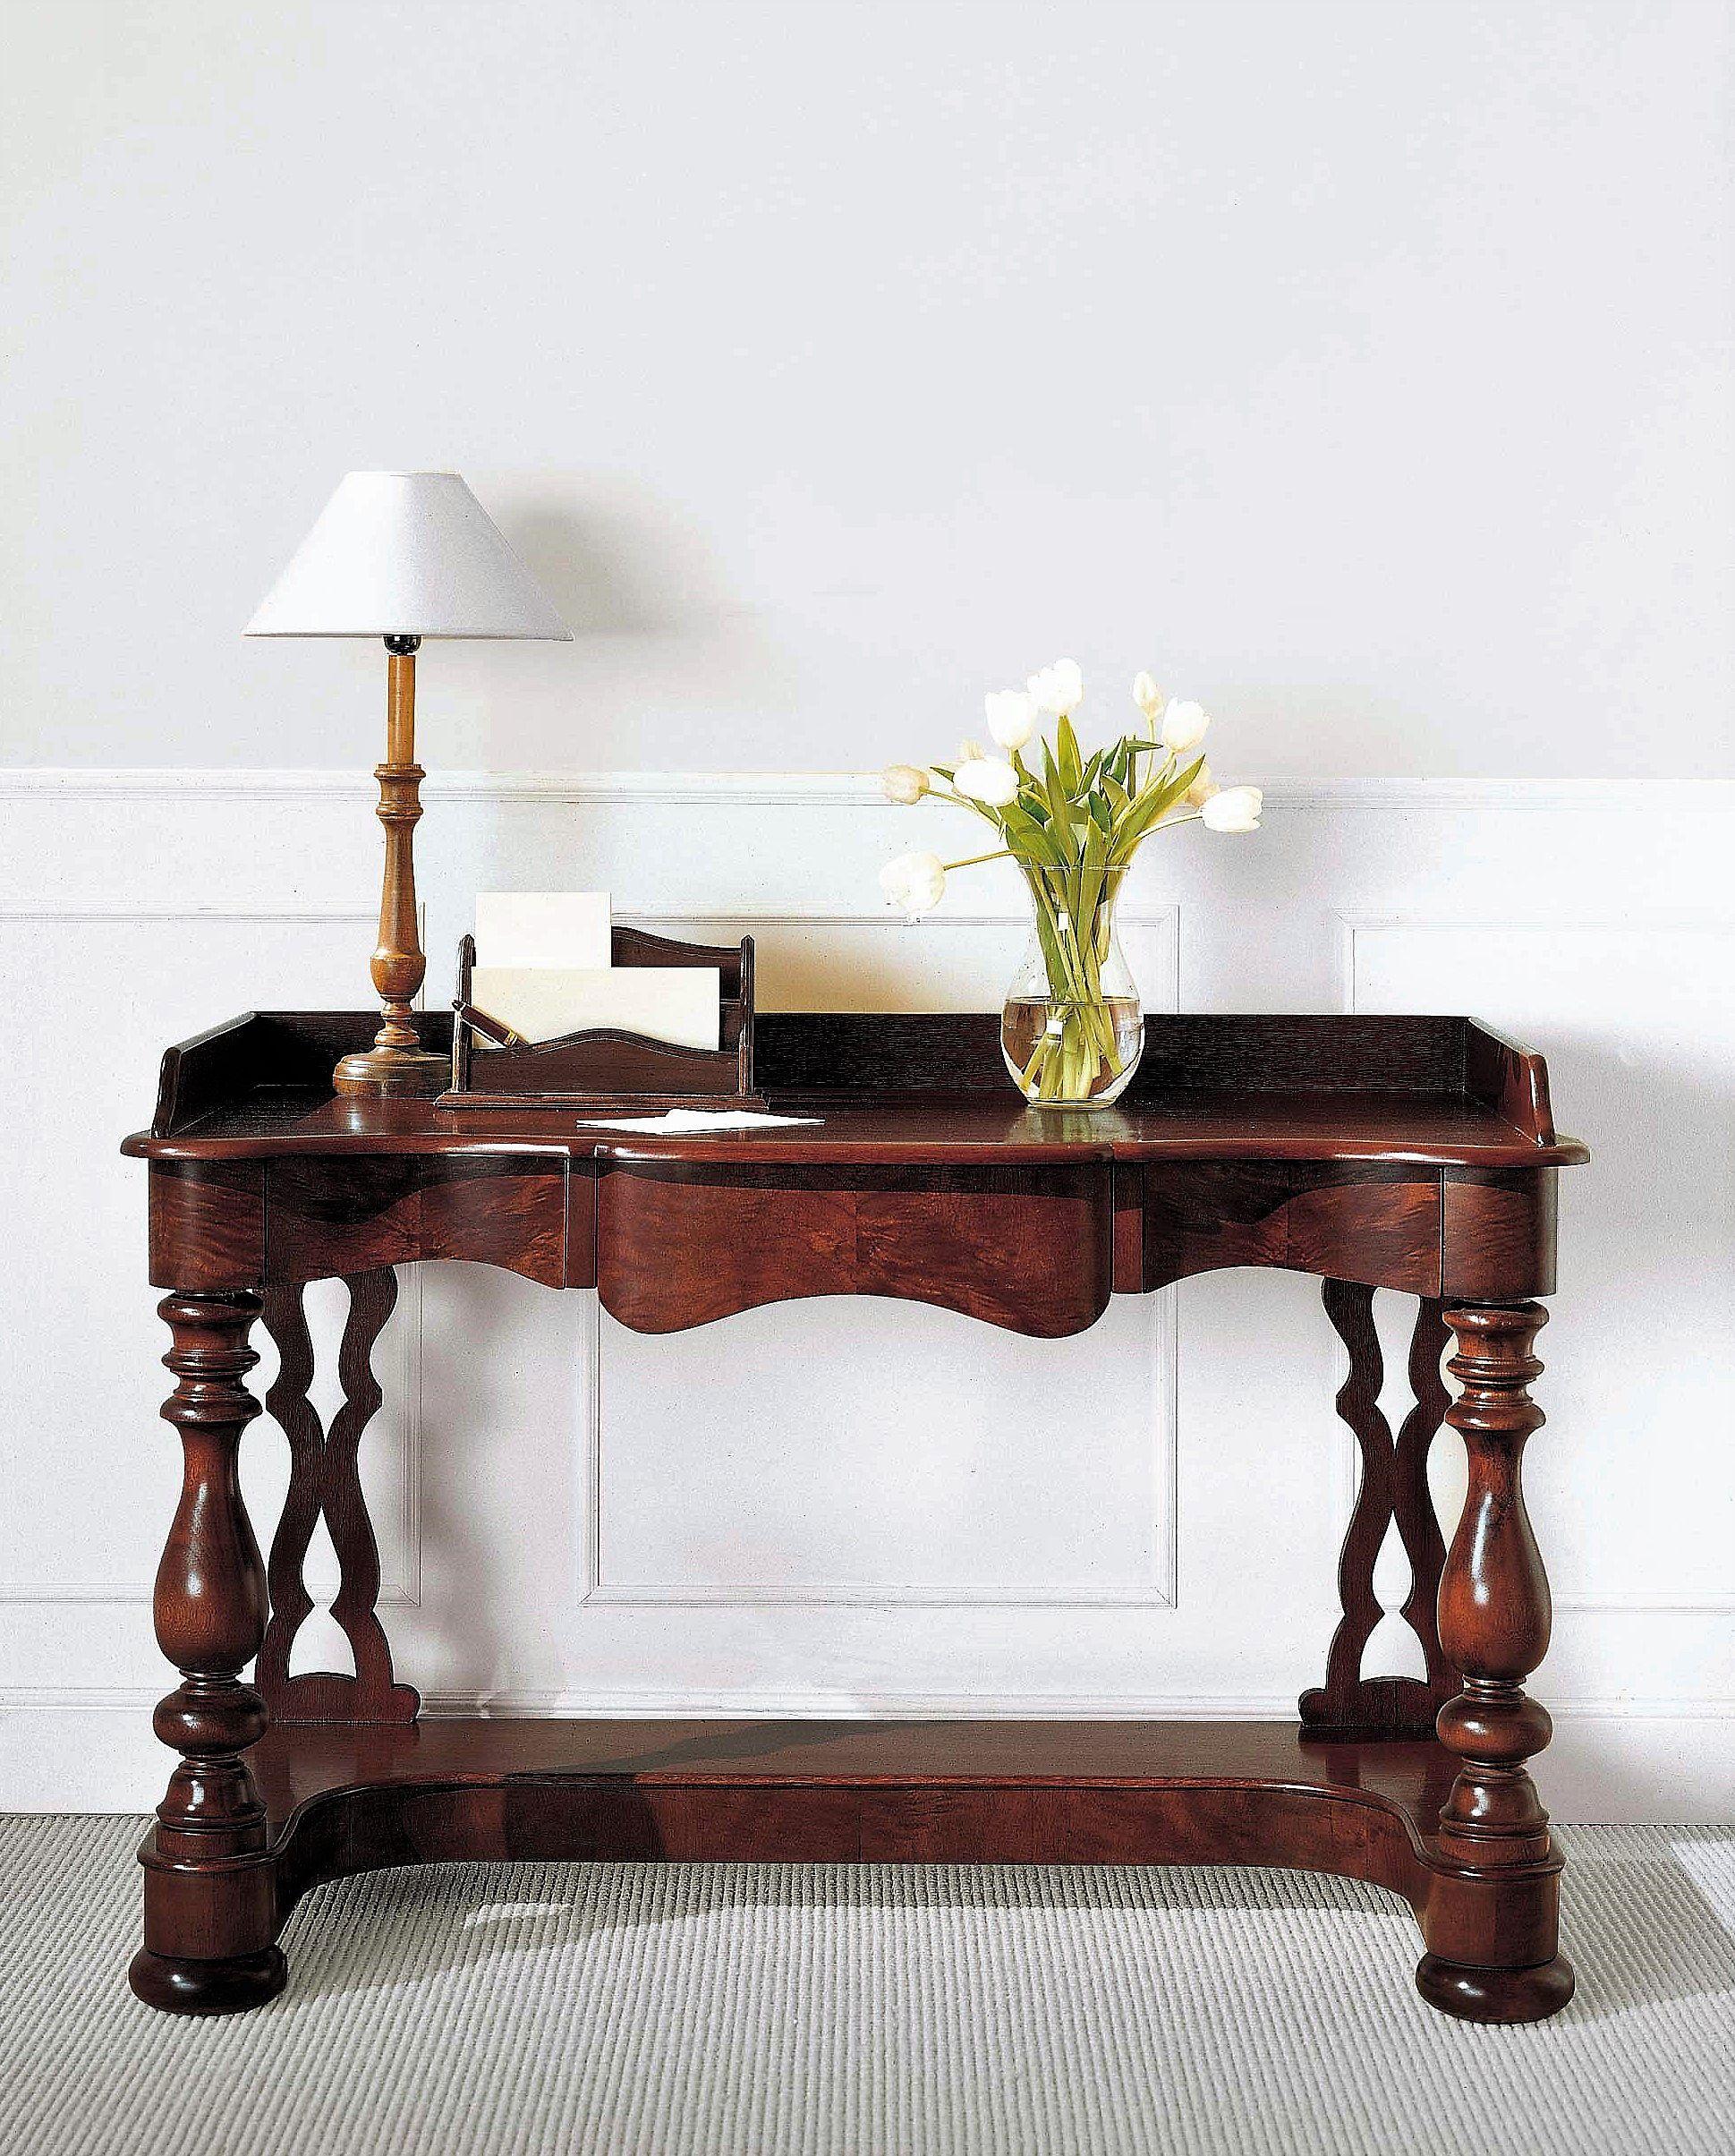 Mueble consola cl sica elegante alta decoraci n - Mesa escritorio clasica ...